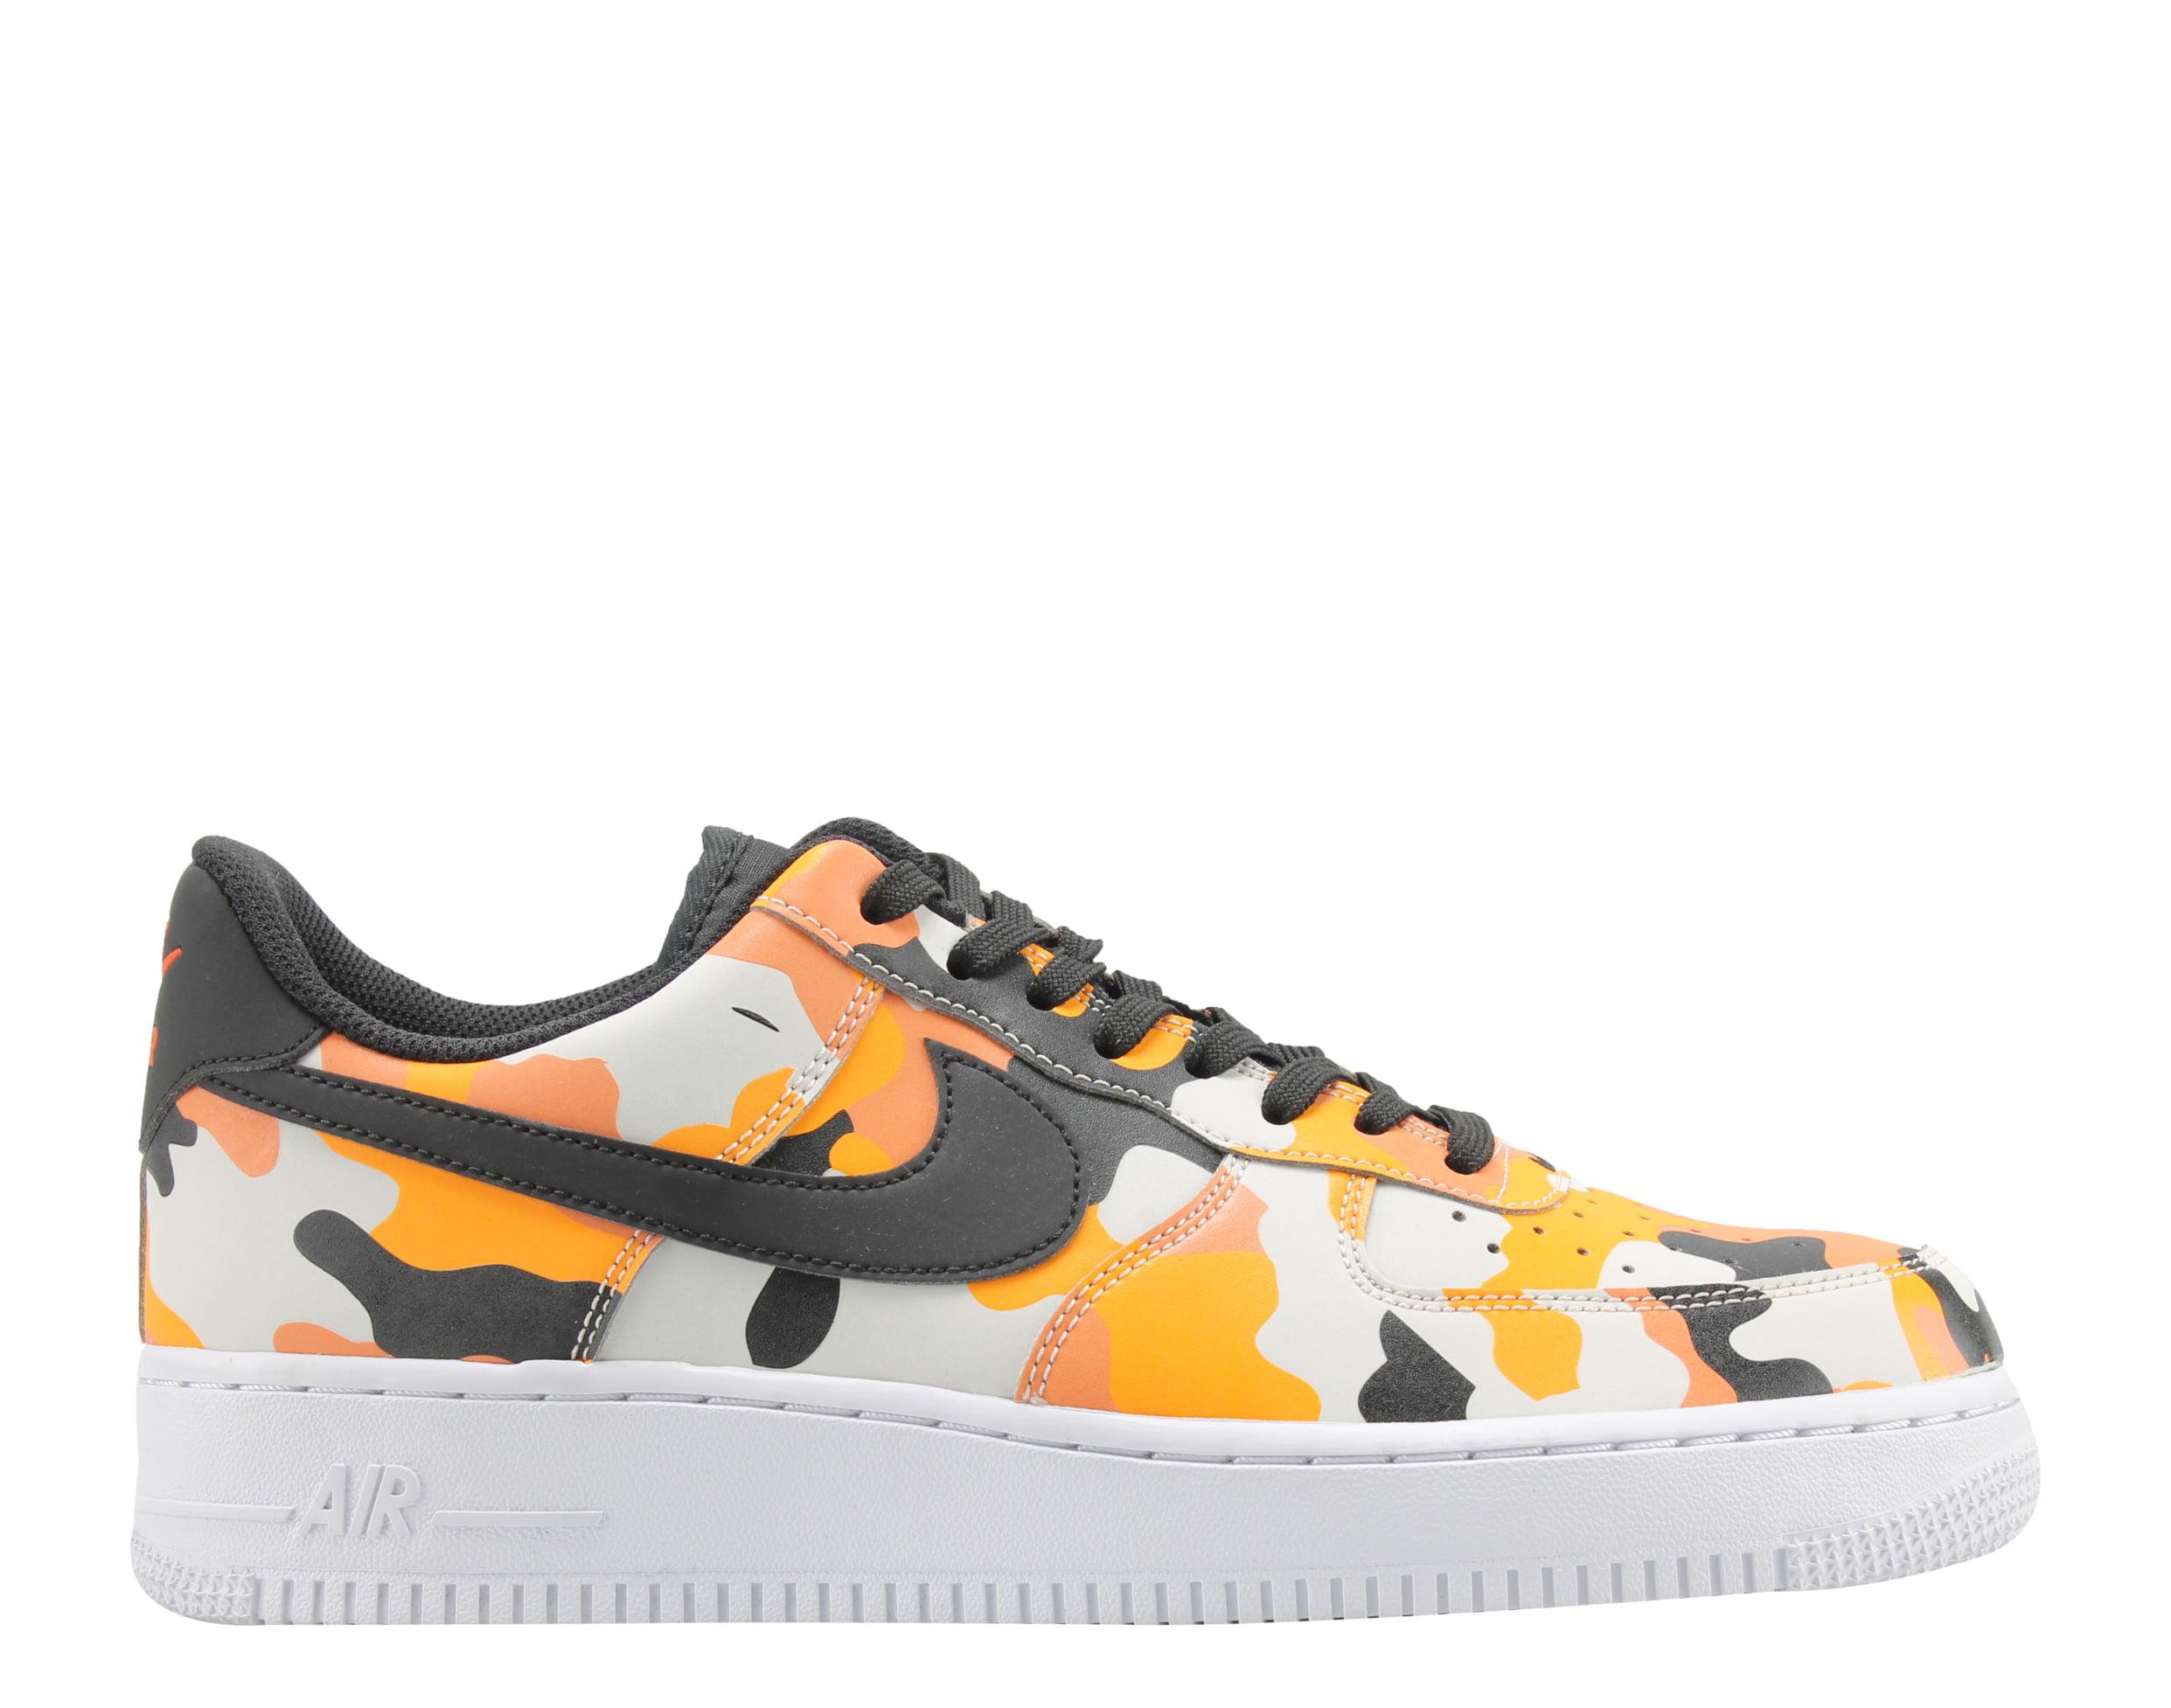 Nike Air Force 1 '07 LV8 Team Orange/Camo Men's Basketball Shoes 823511-800